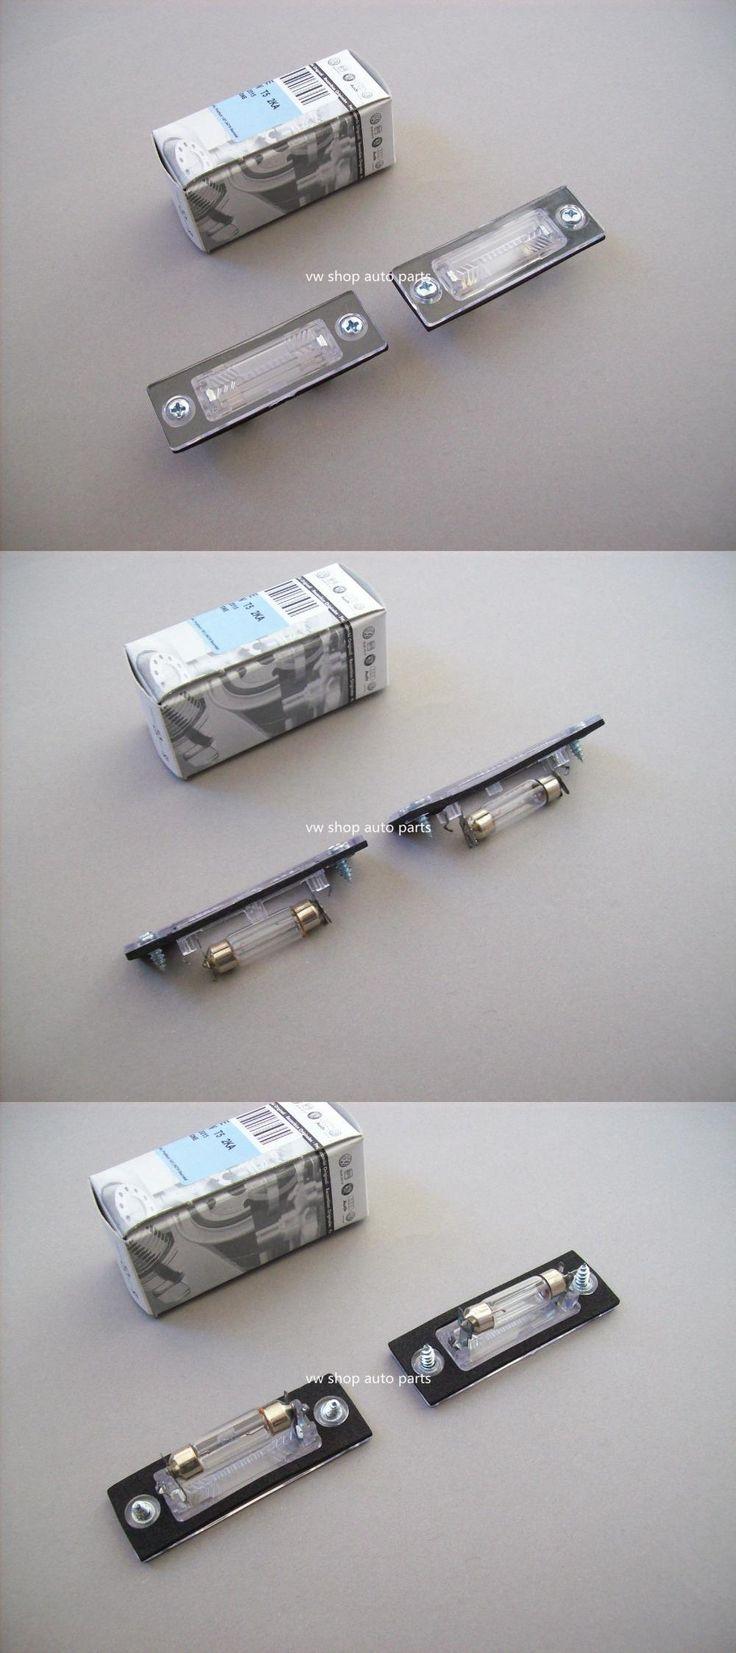 [Visit to Buy] 2PCS  Transporter T5 03-09 Caddy 2K Jetta 1K Passat 3C2 Number Plate Lights Lamps #Advertisement